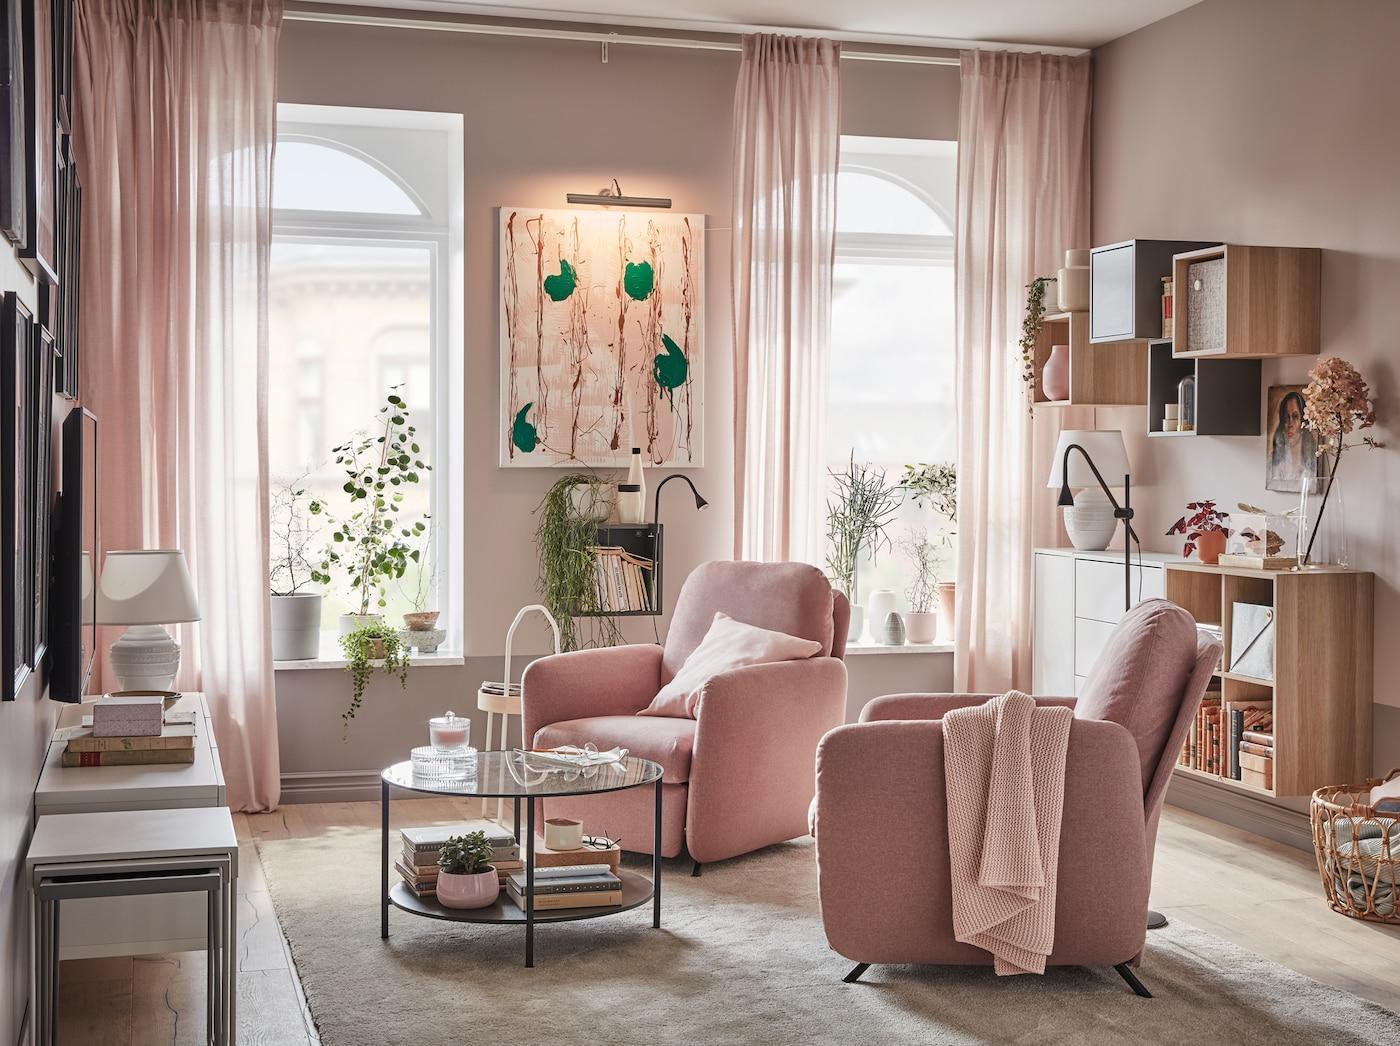 Ikea skap stue. Skap til varmtvannsbereder ikea 2019-12-28